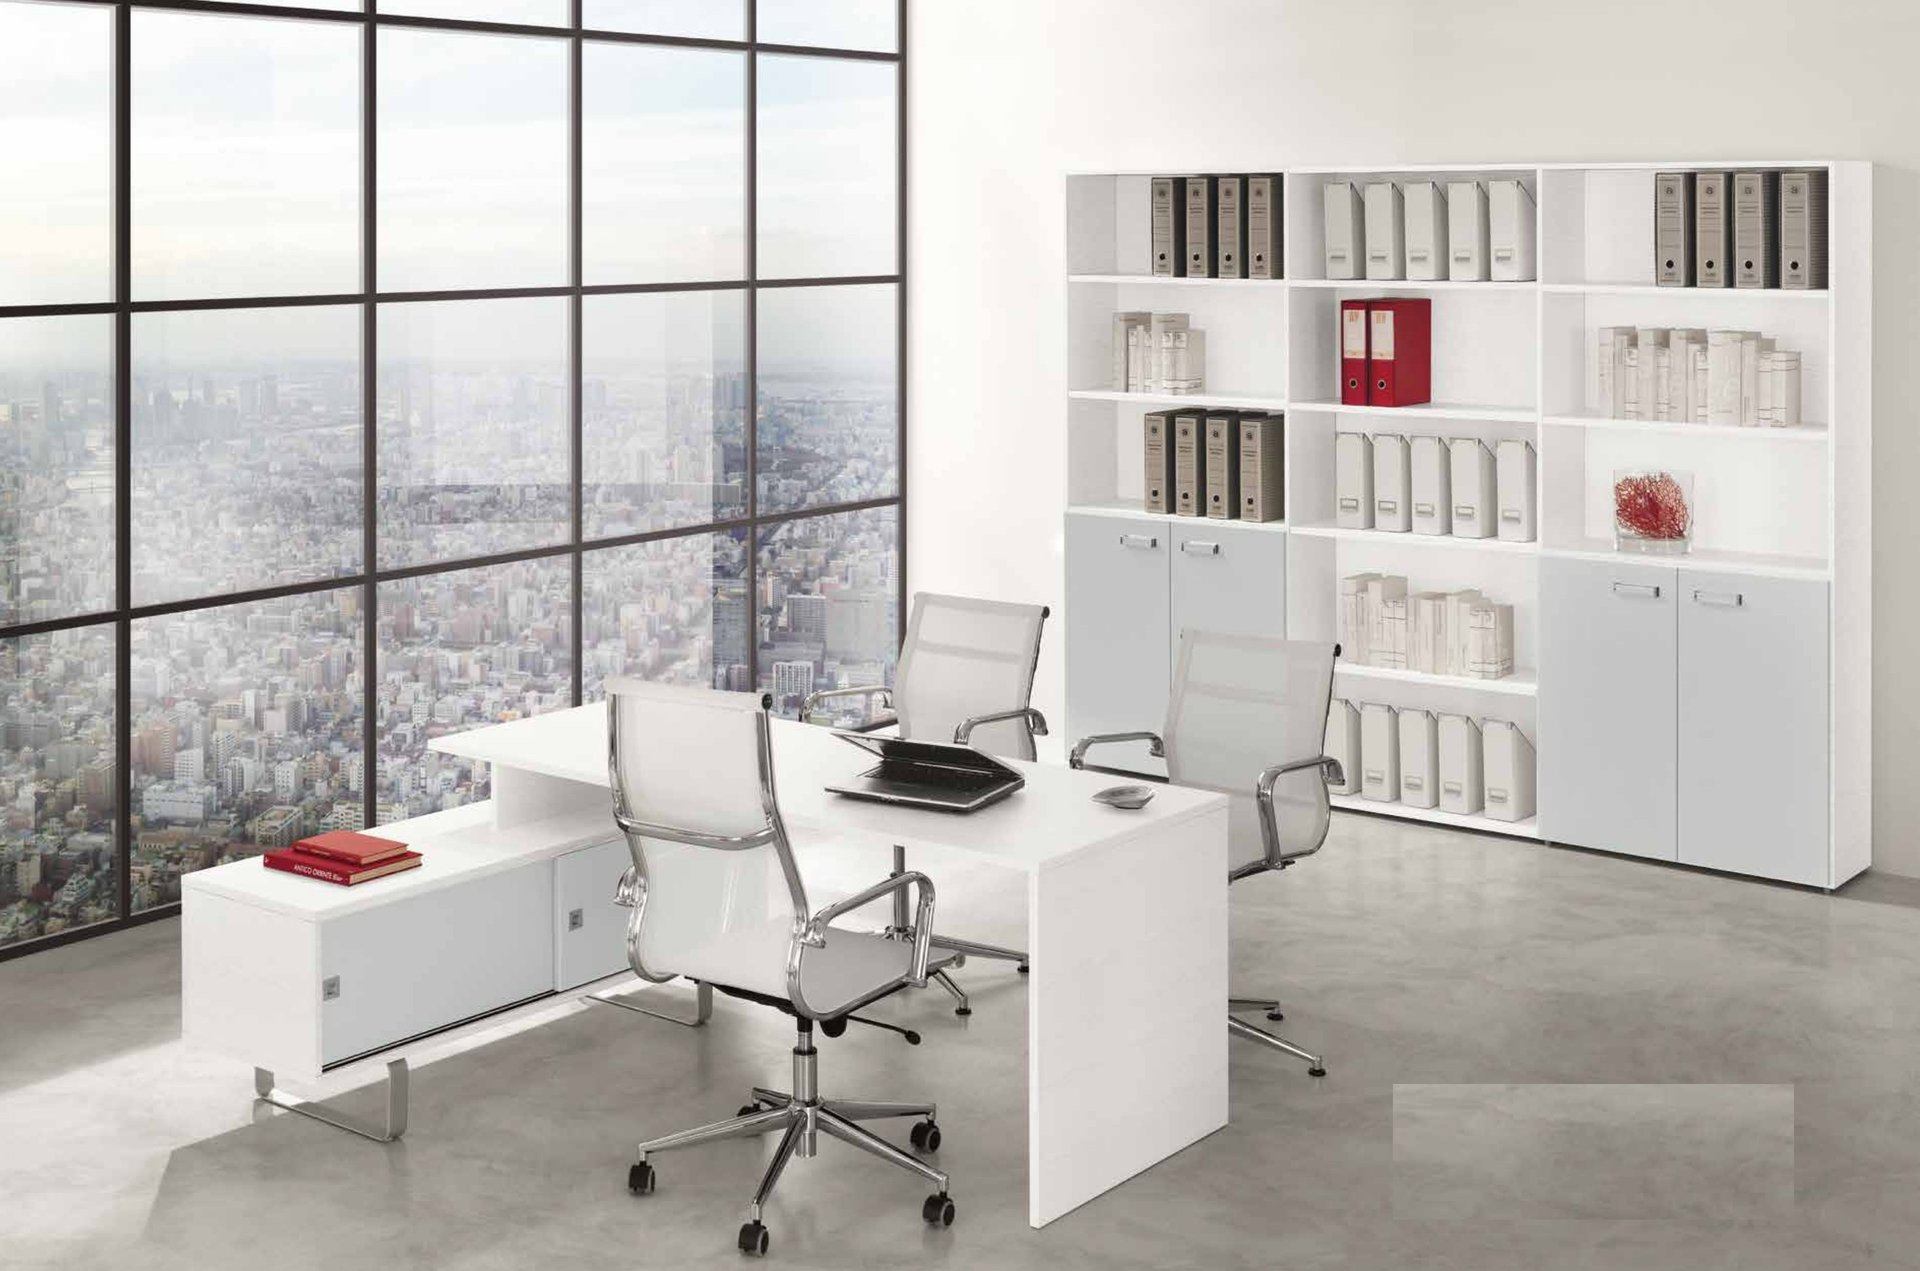 Mobili da ufficio moderni avezzano savina mobili for Mobili ufficio moderni